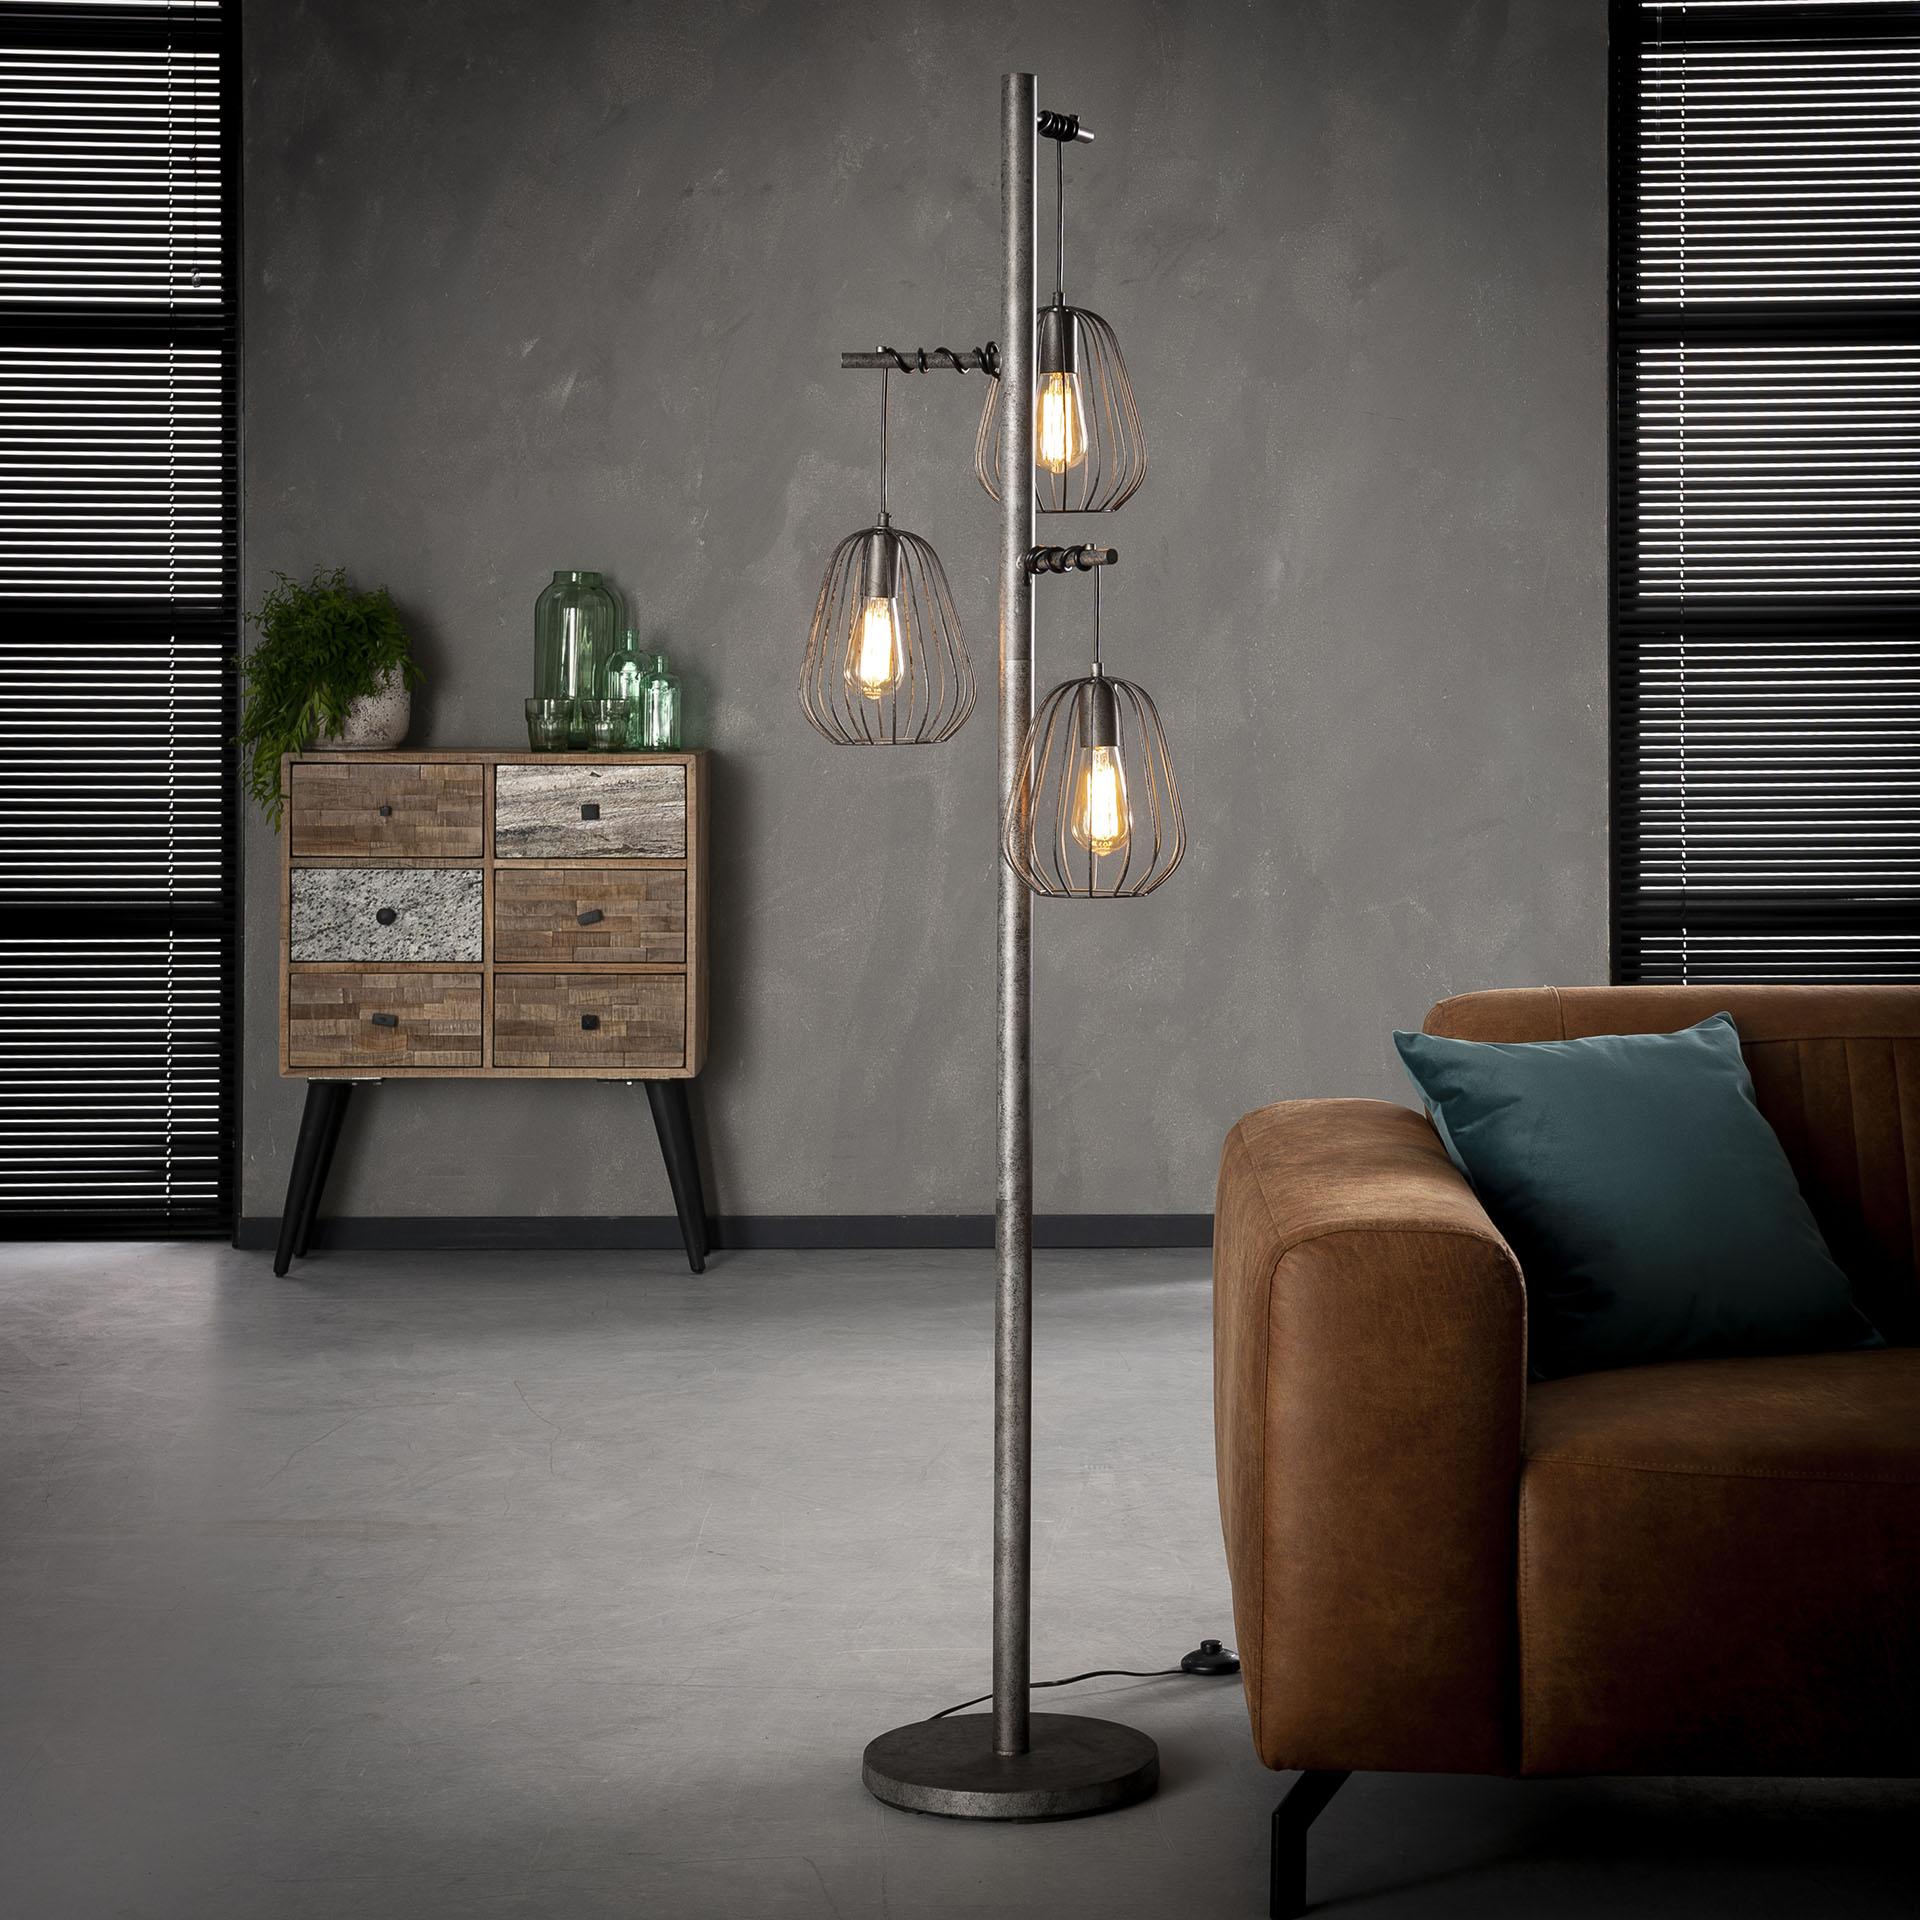 Stehlampe Stehleuchte Lampen Metall Vintage 3 Flammig